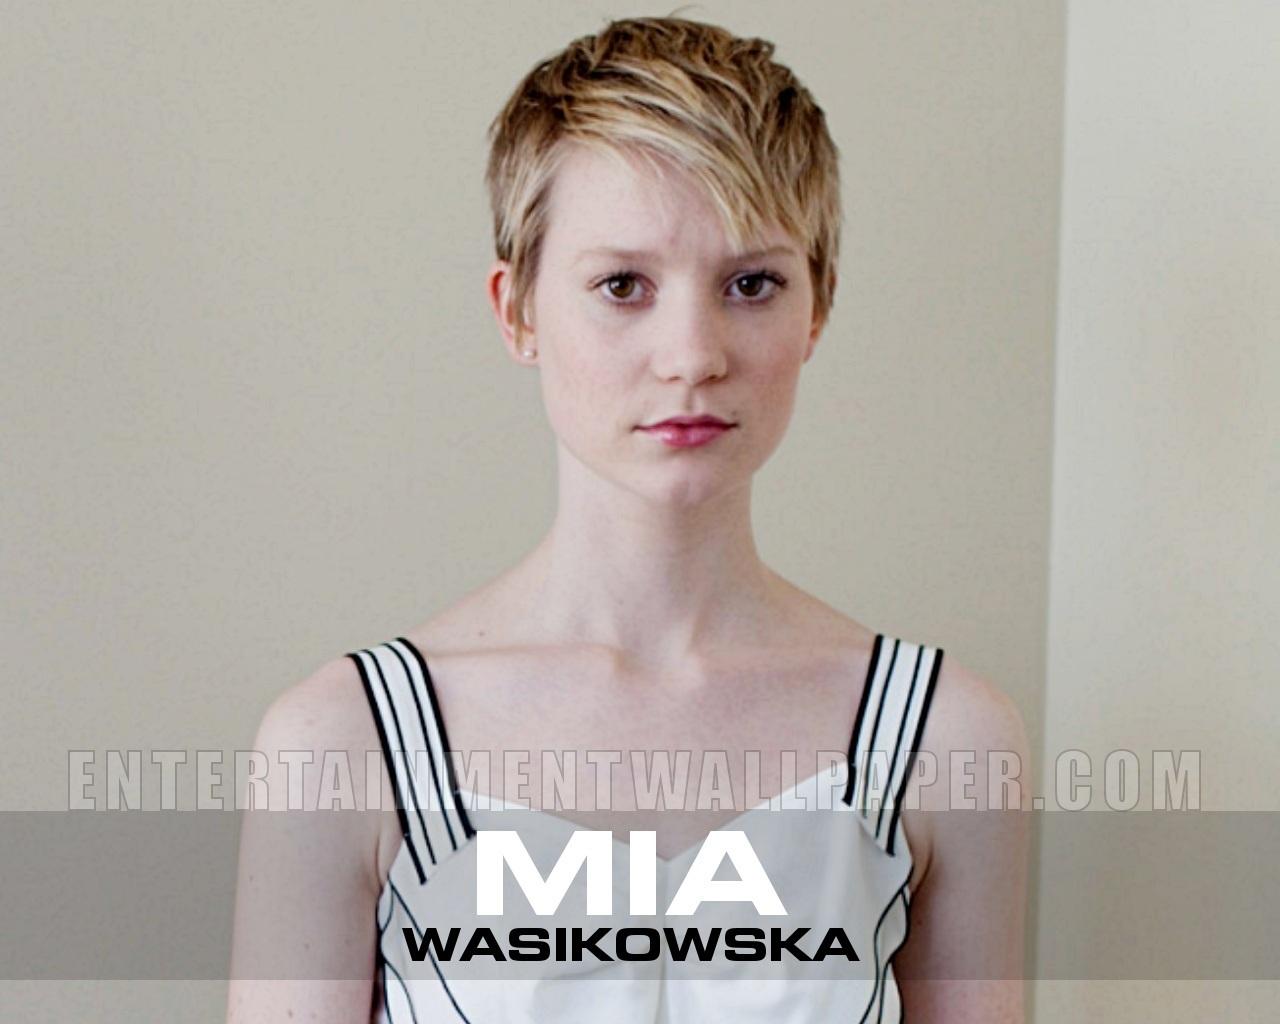 mia-wasikowska Wallpaper